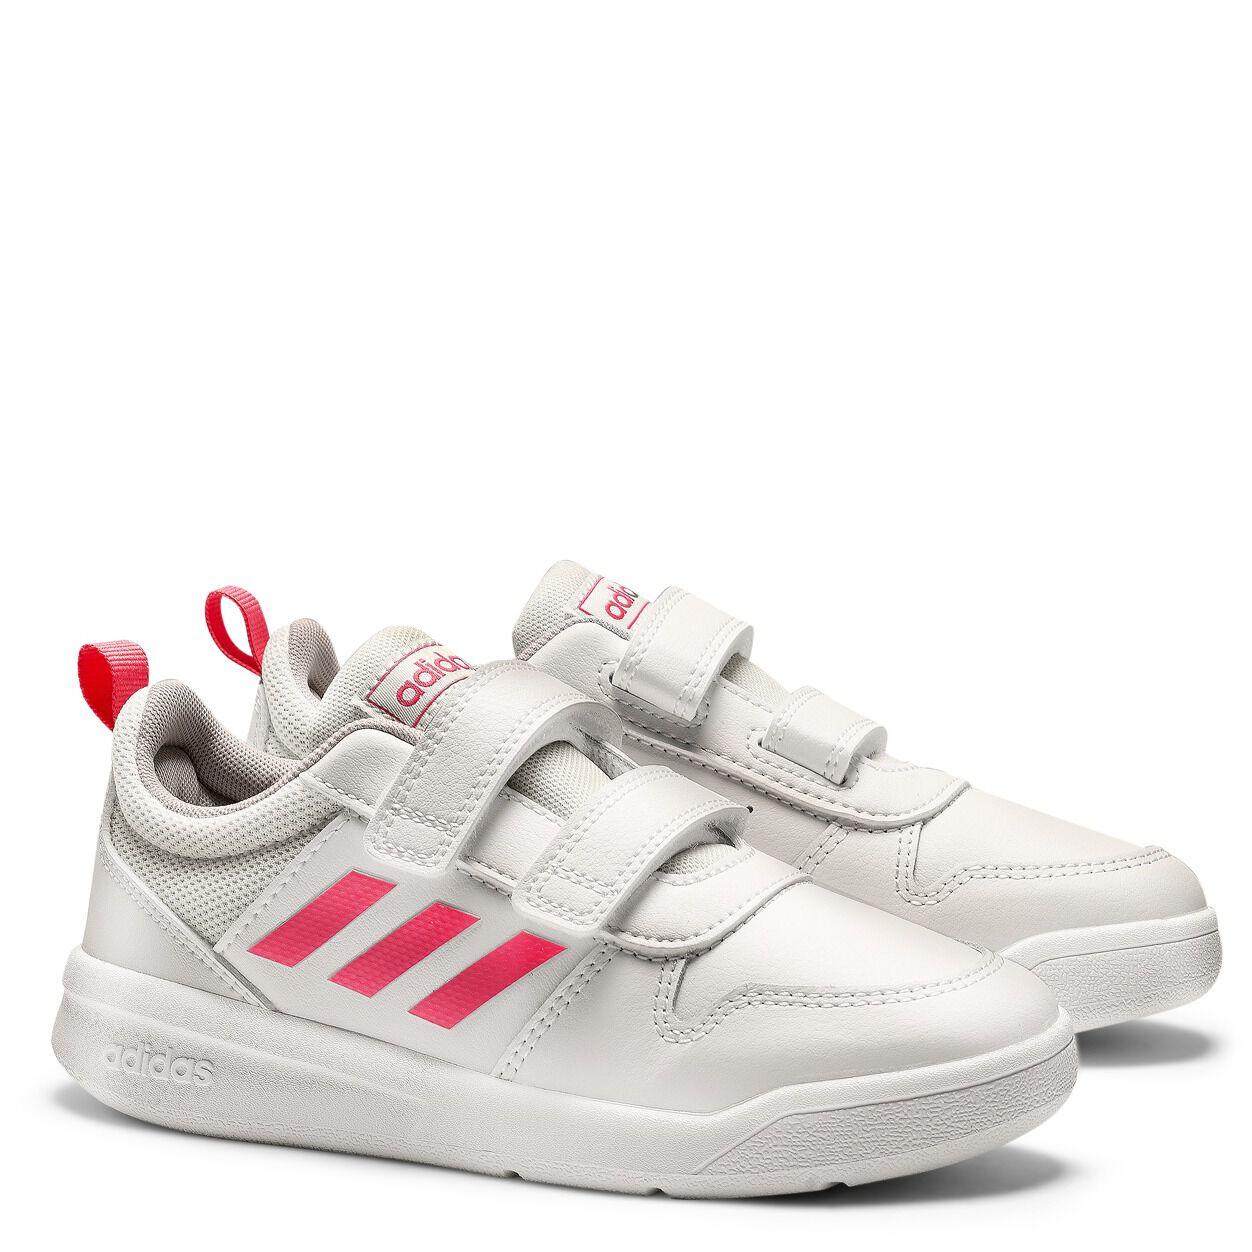 scarpe bimba 18 primi passi adidas